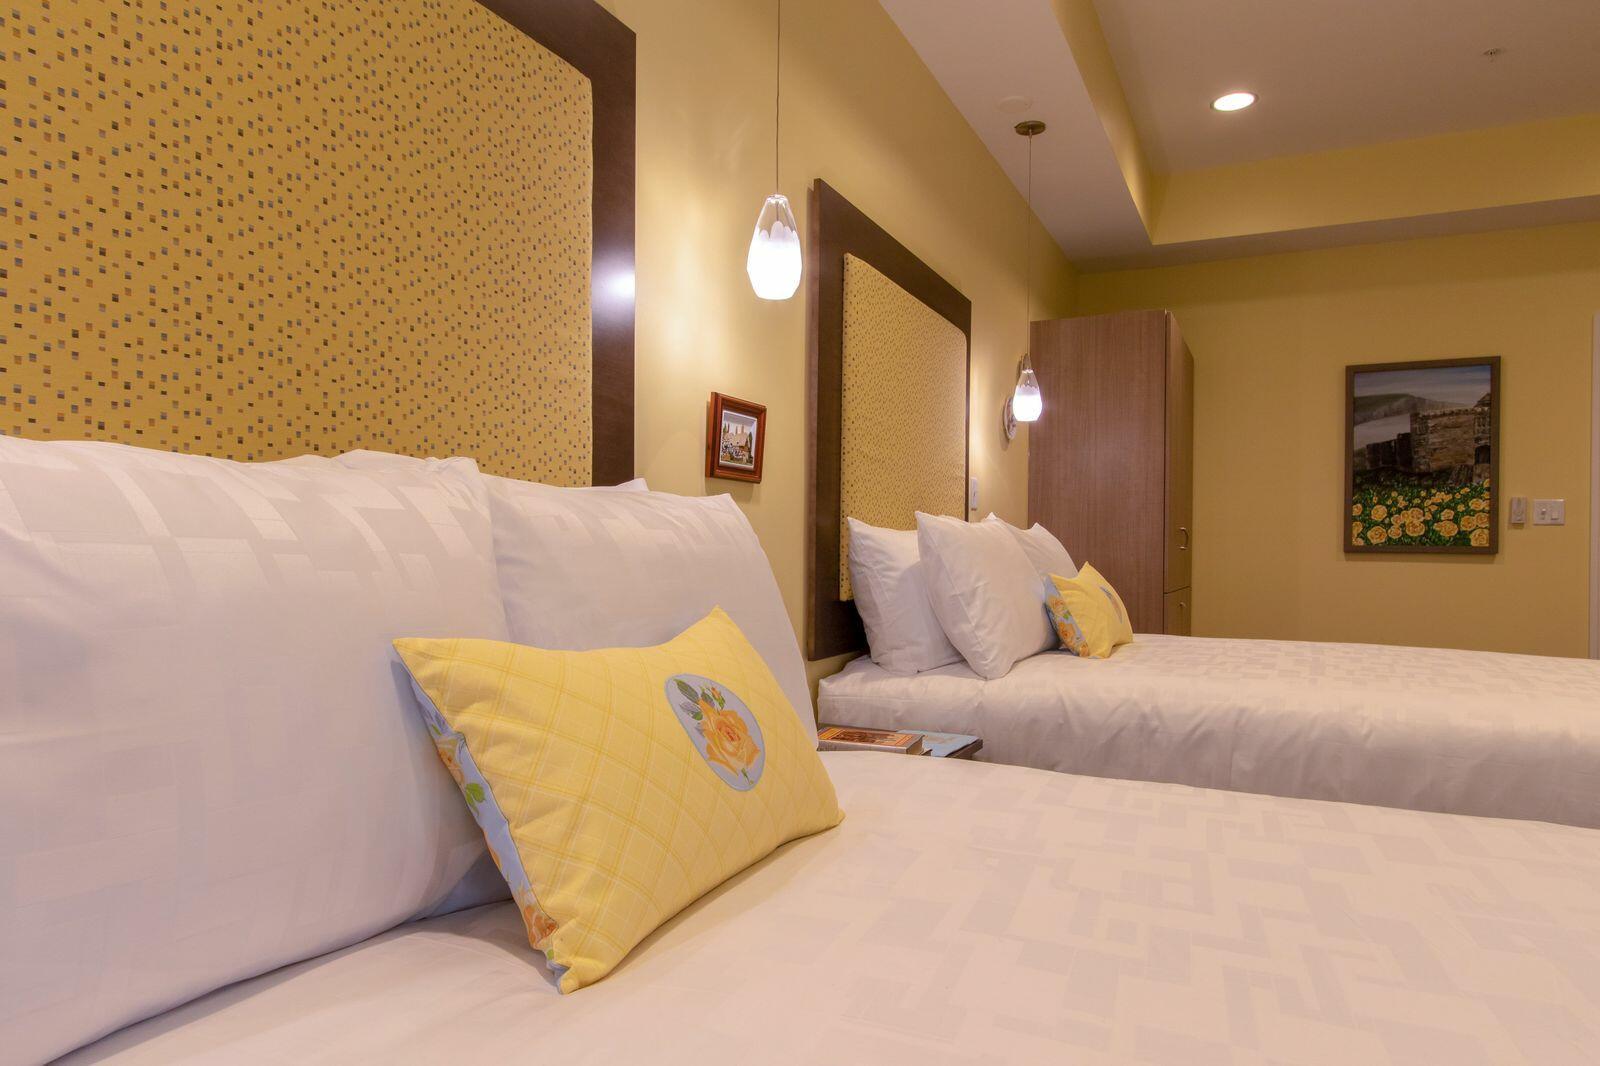 England-themed hotel room.